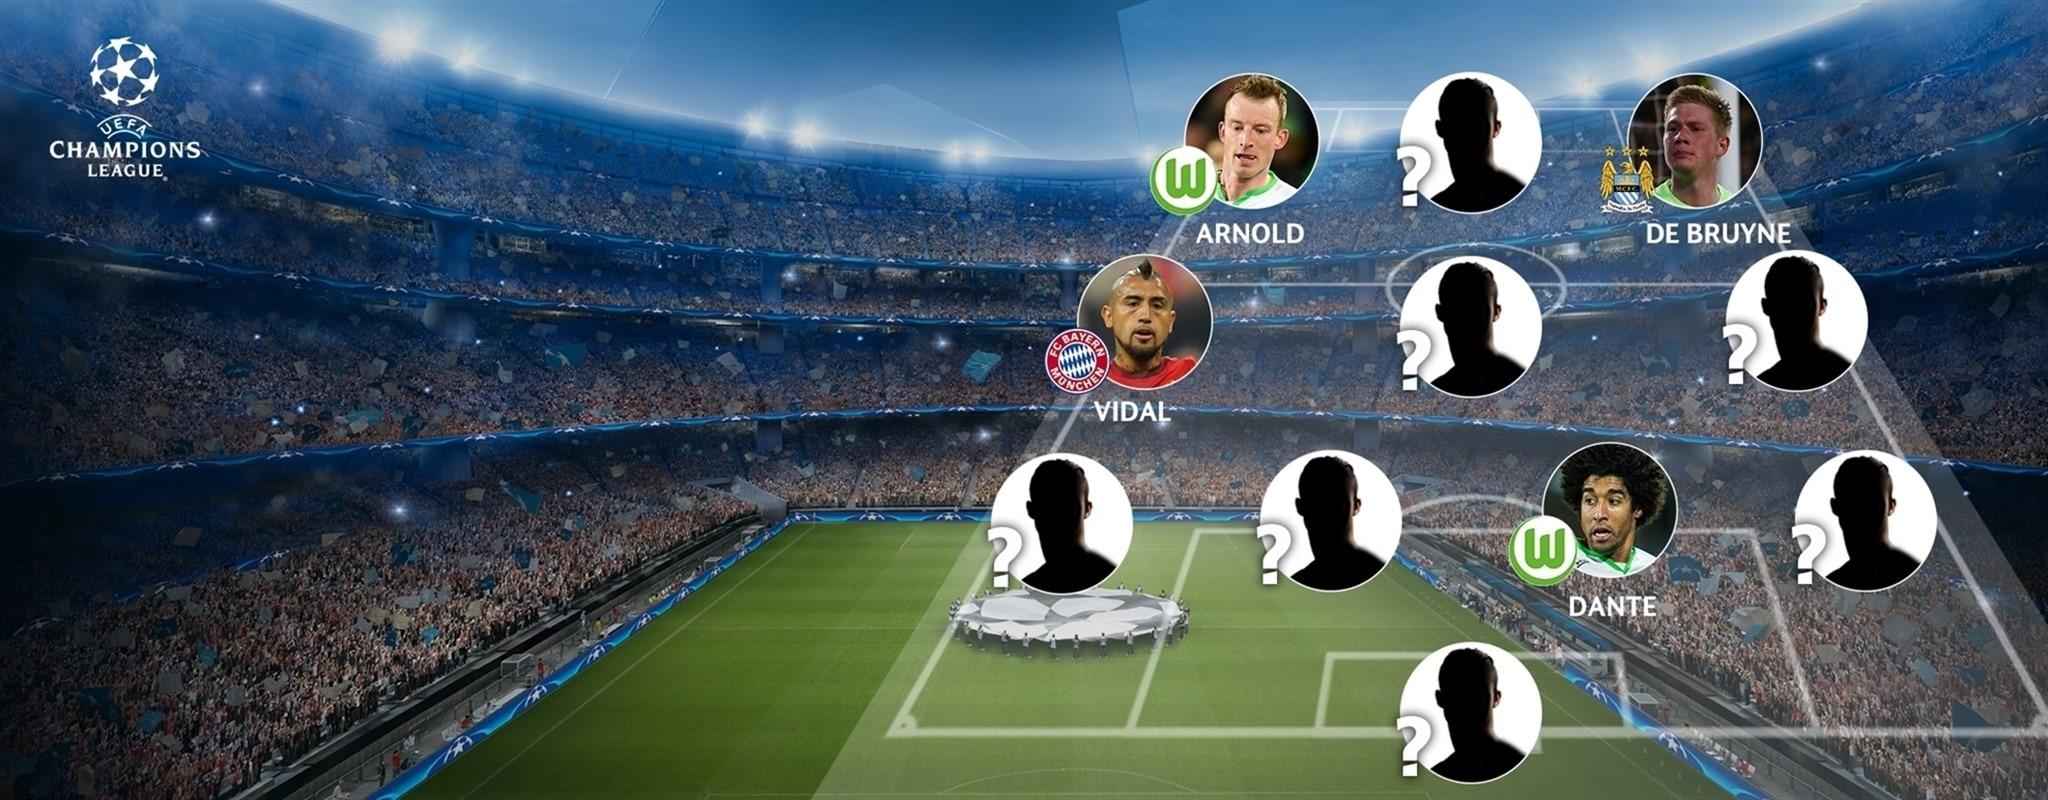 uefa champions league � uefacom